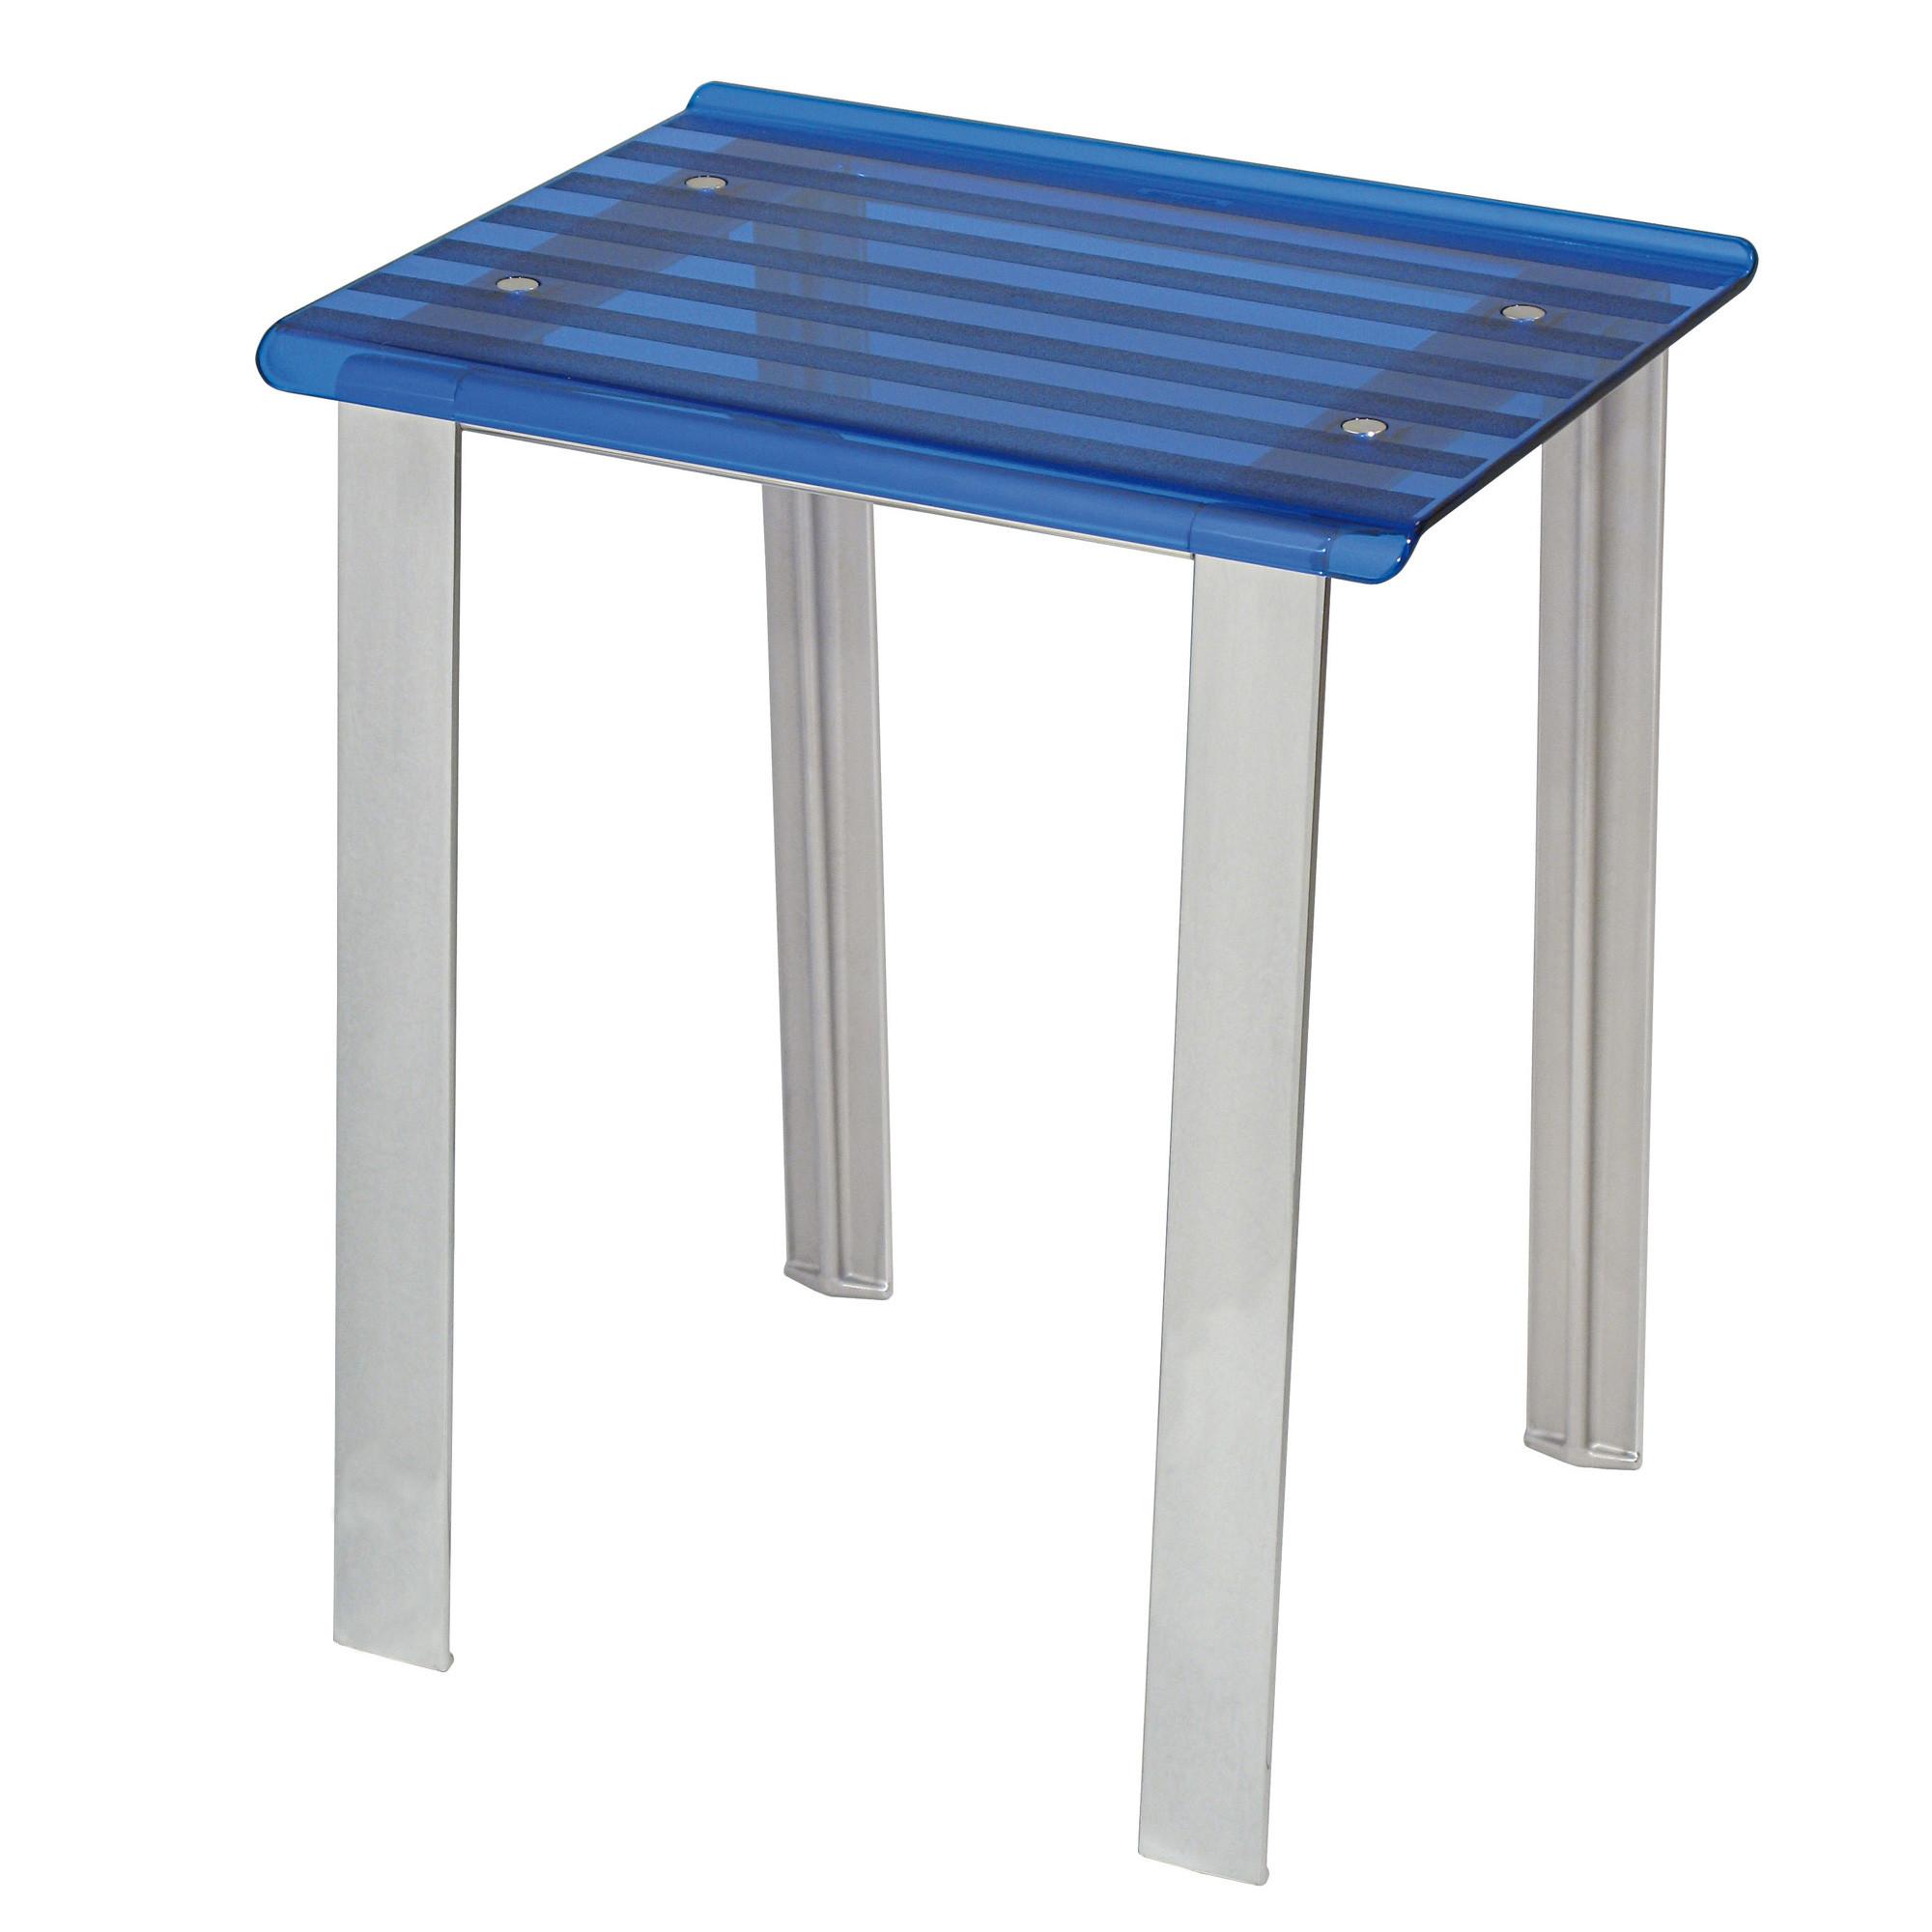 tabouret de douche leo bleu transparent - Tabouret De Douche Transparent